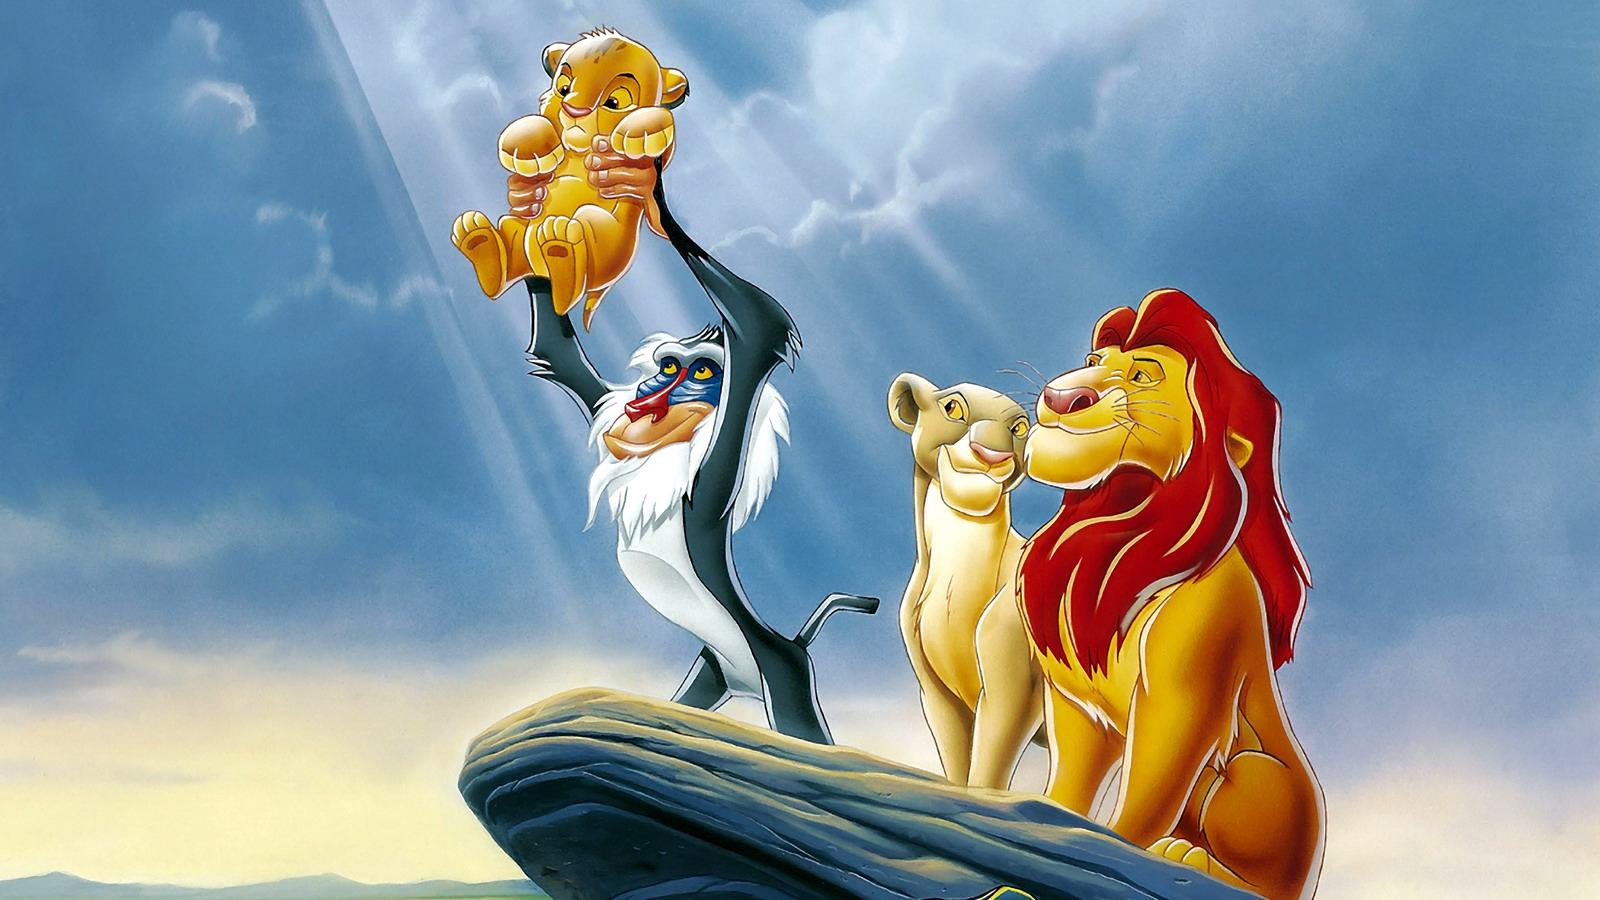 The lion king the lion king wallpaper 39056120 fanpop - Lion king wallpaper ...